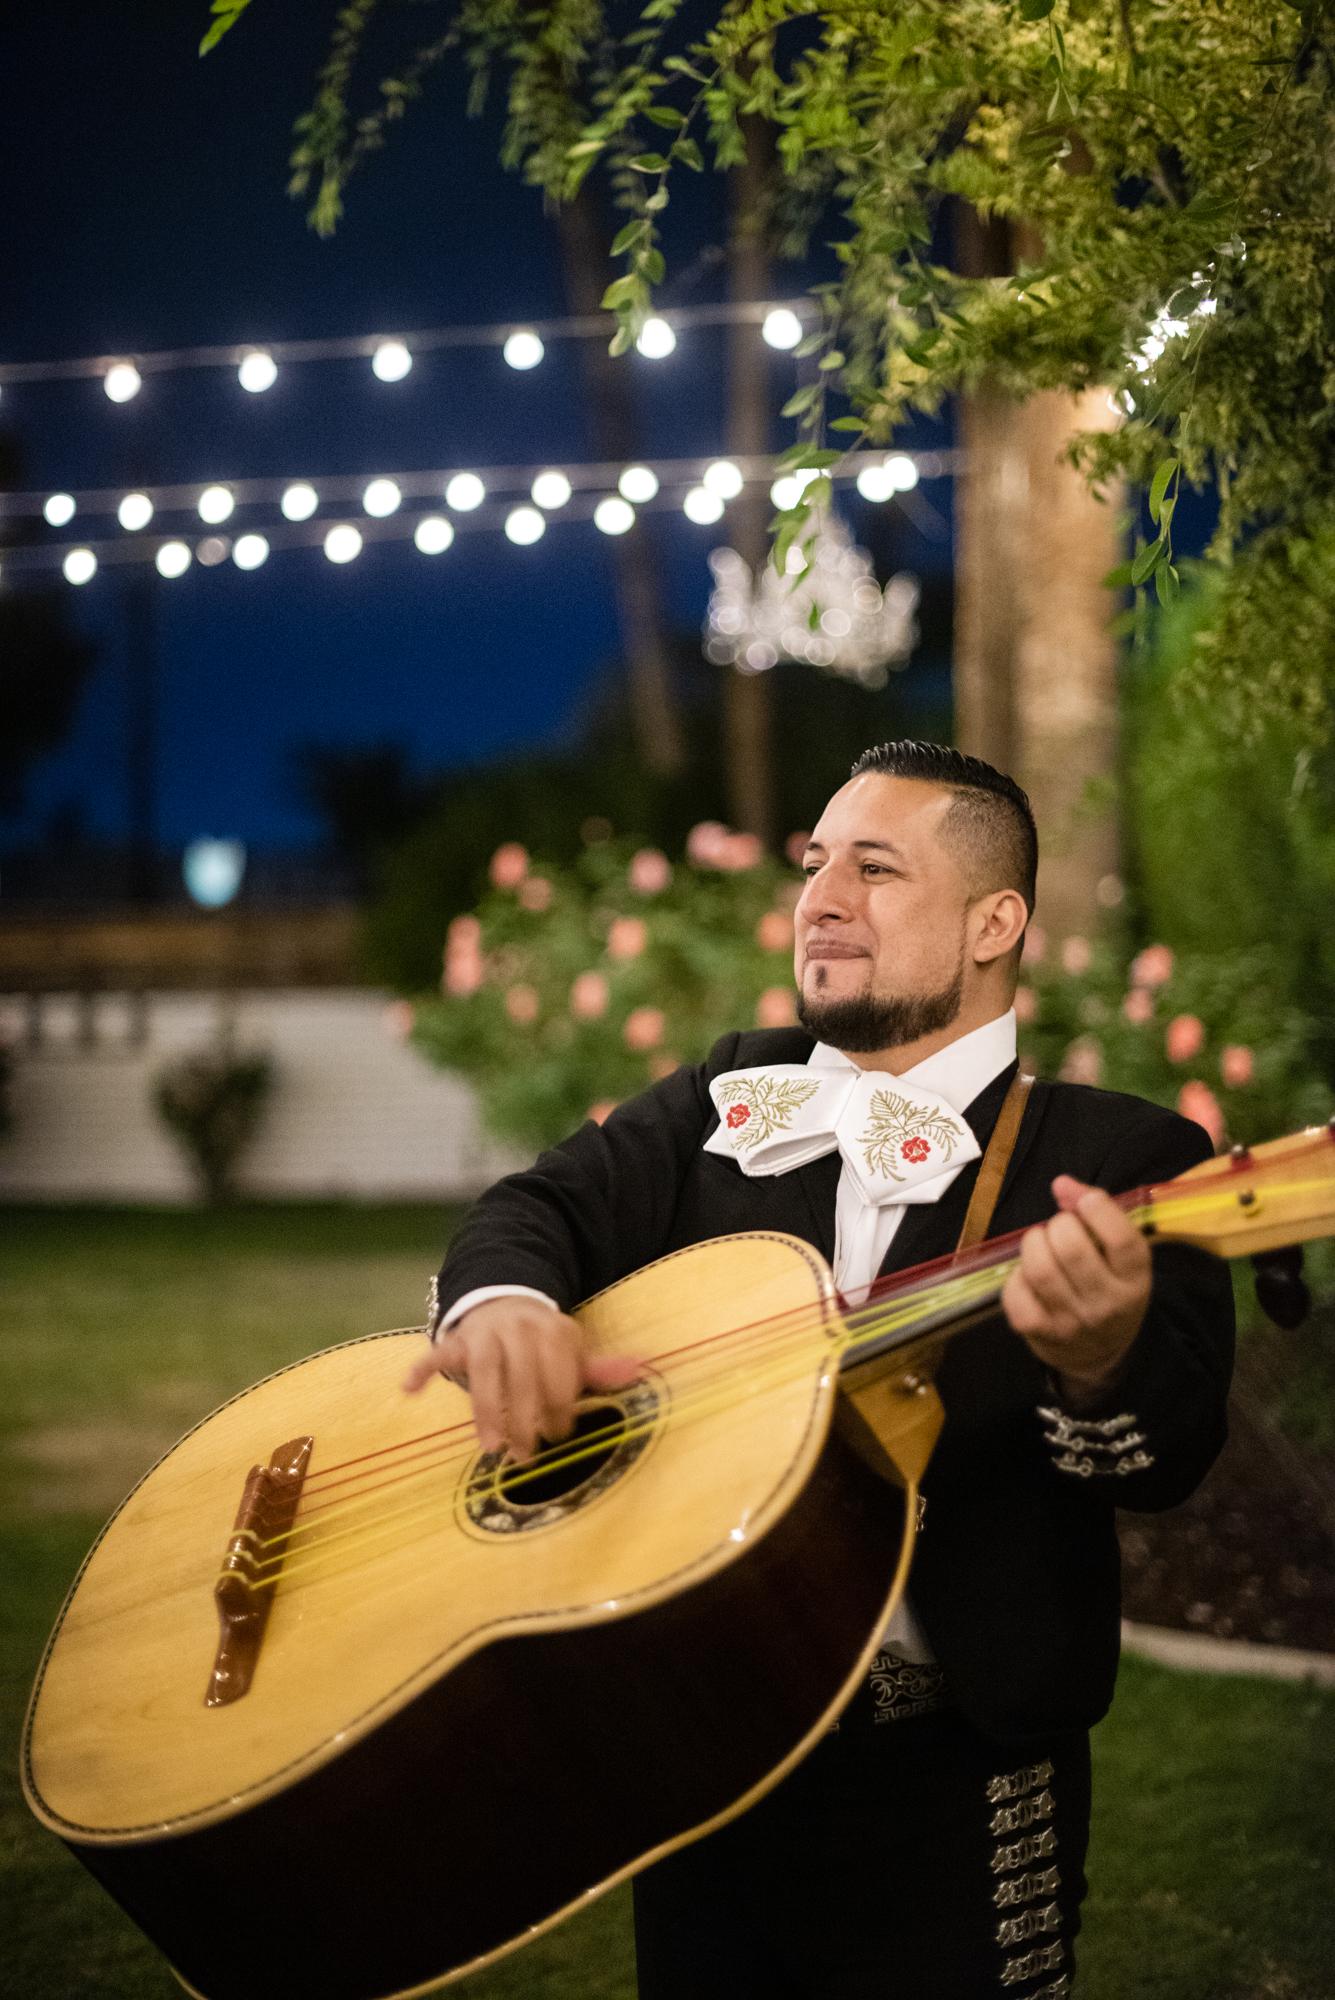 mariachi-band-Arizona.jpg